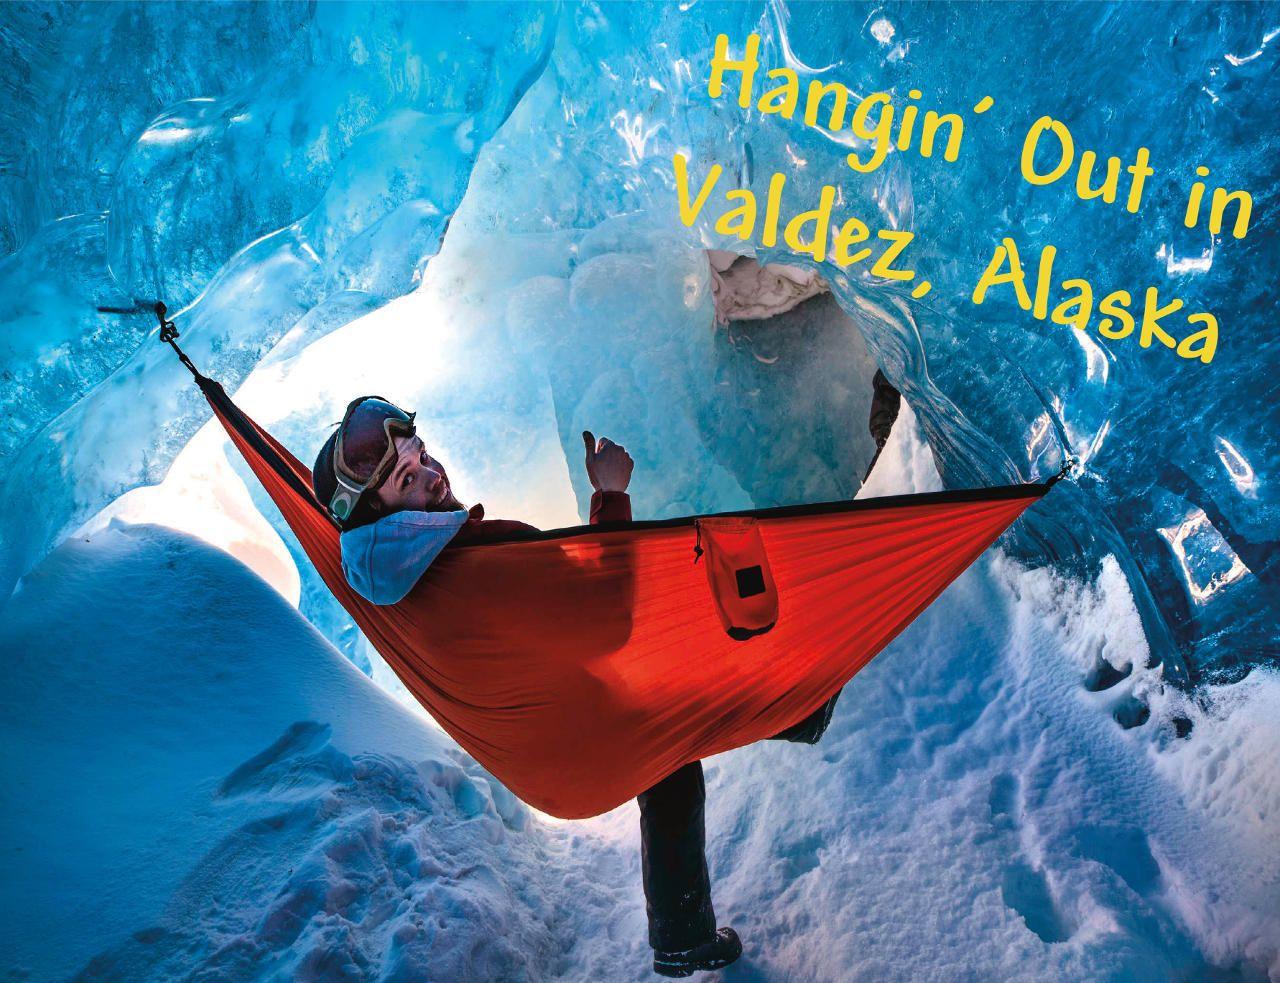 Hangin Out in Valdez Alaska Photo by Alaska Photography Co. Usage for Matador 2017